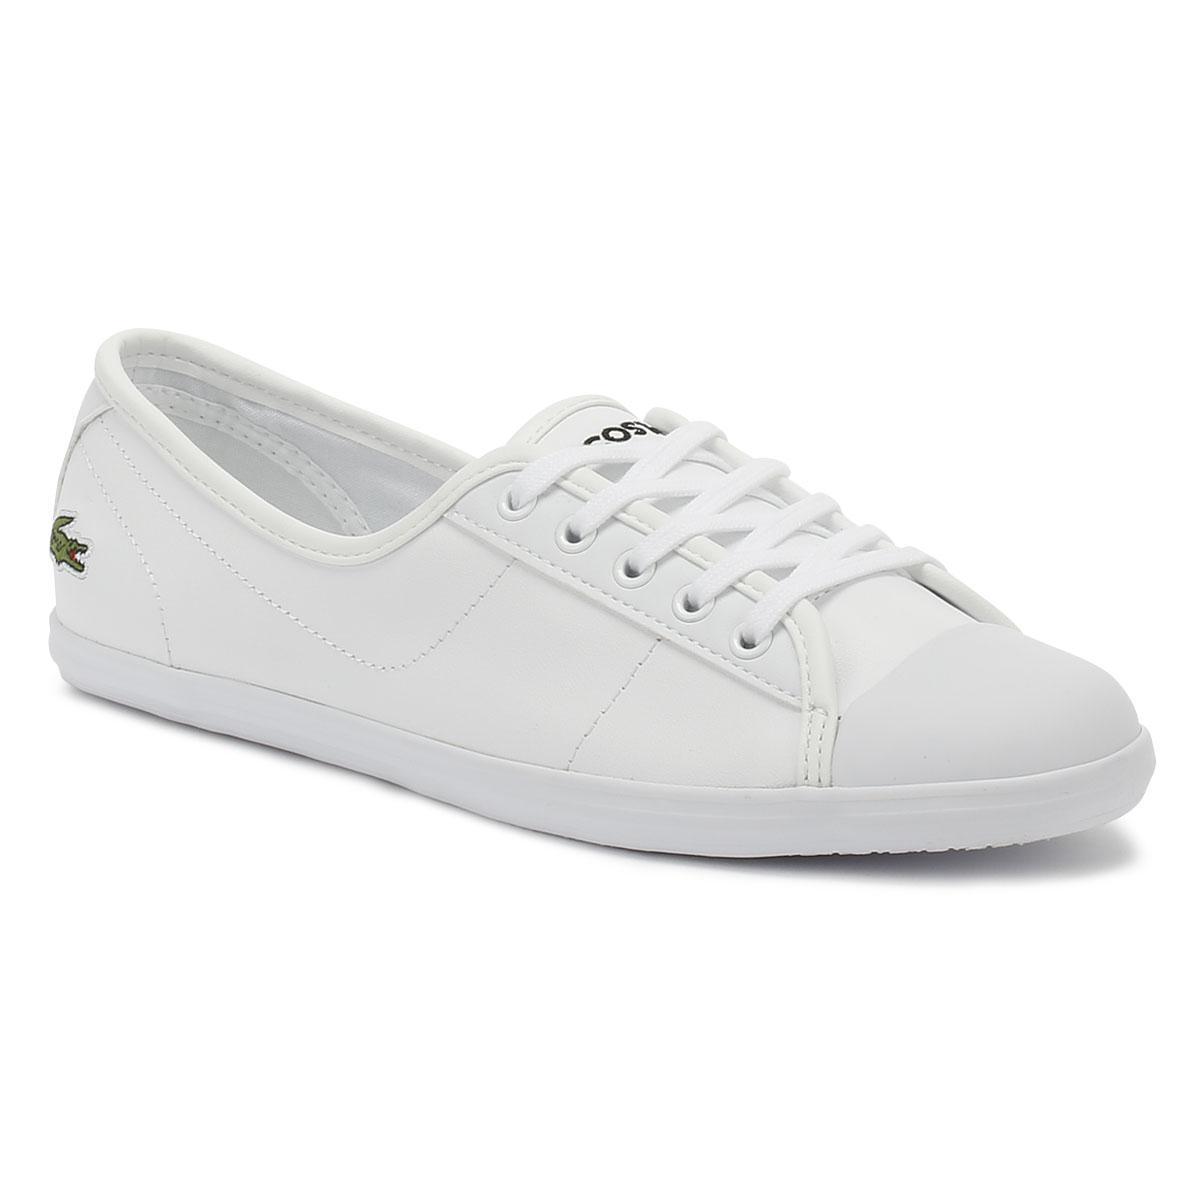 322b450fbd798 Lyst - Lacoste Ziane Bl 1 Cfa Womens White Trainers in White